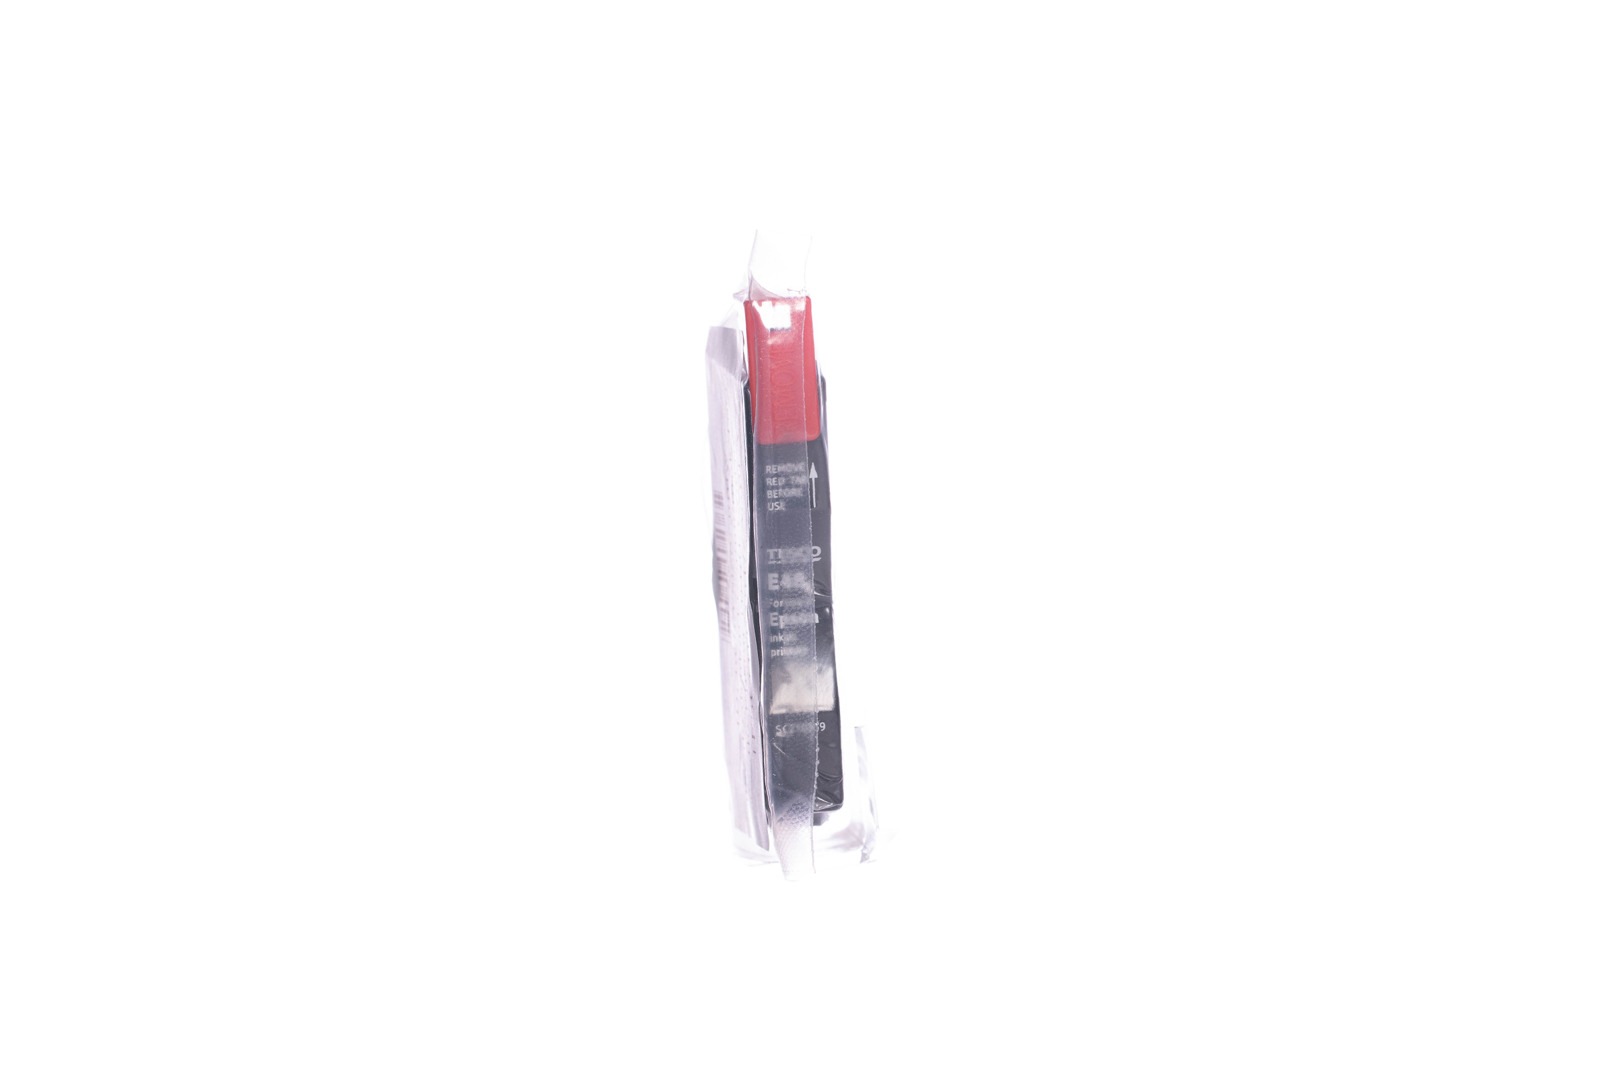 Remanufactured Ink cartridge Tesco Epson T1802 Cyan